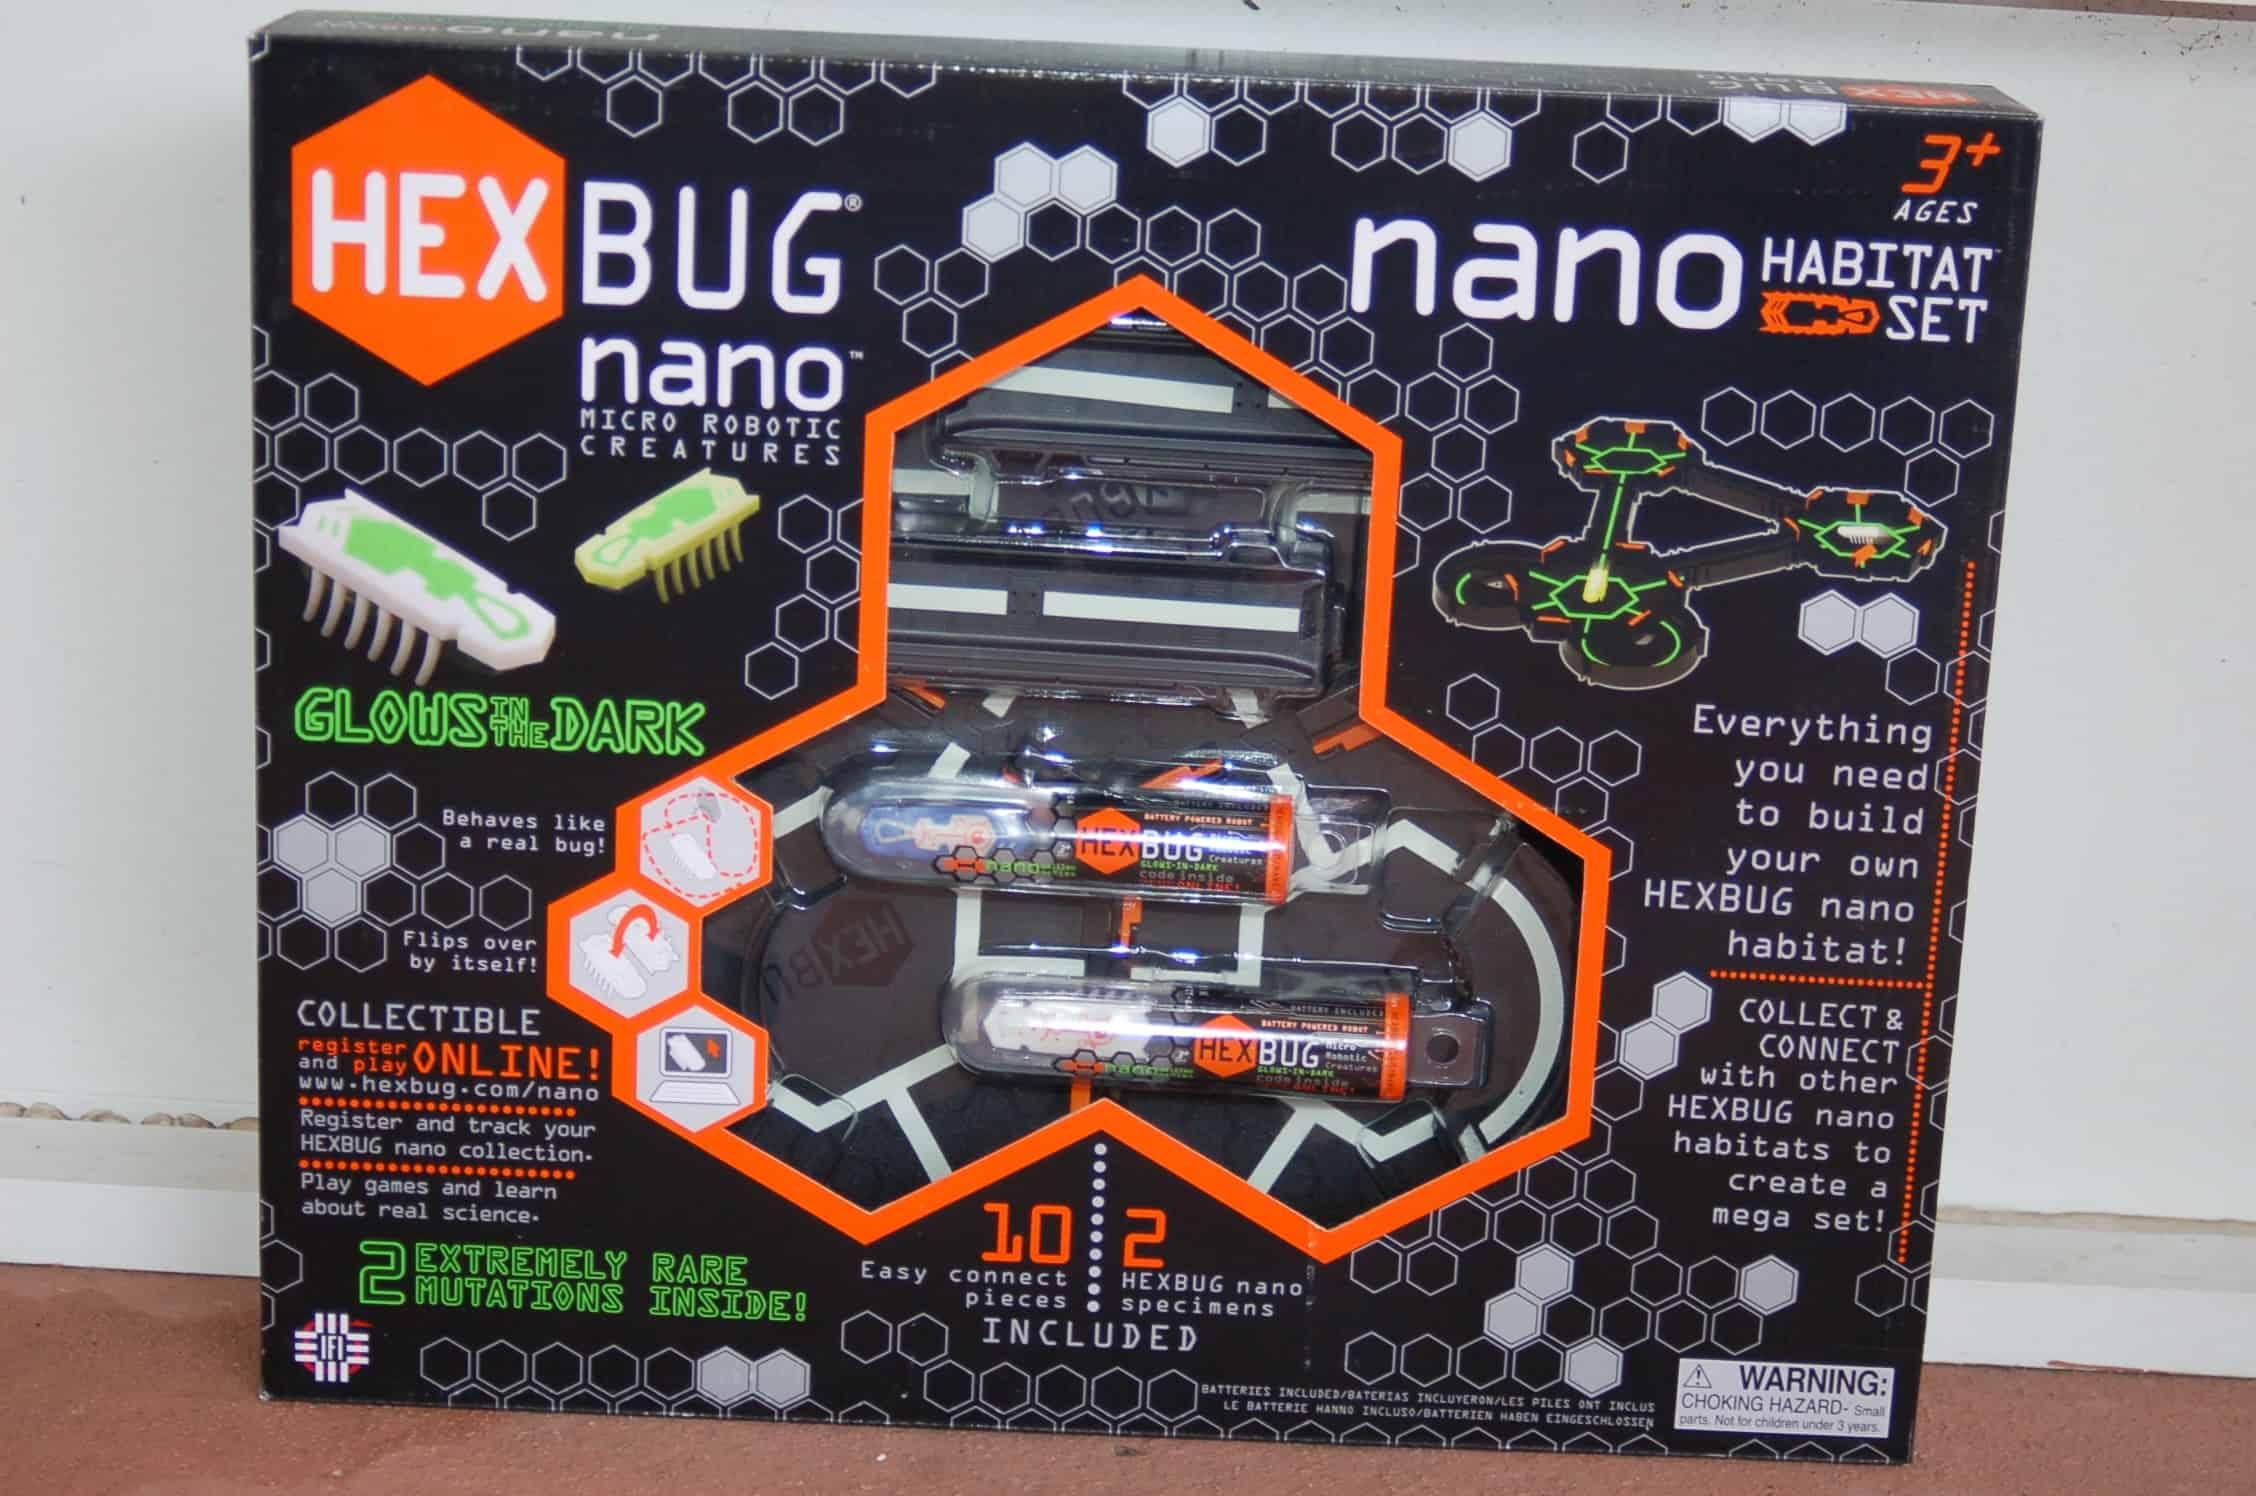 Hexbug Nano Habitat Set Glow in The Dark The Dark Nano Habitat Set